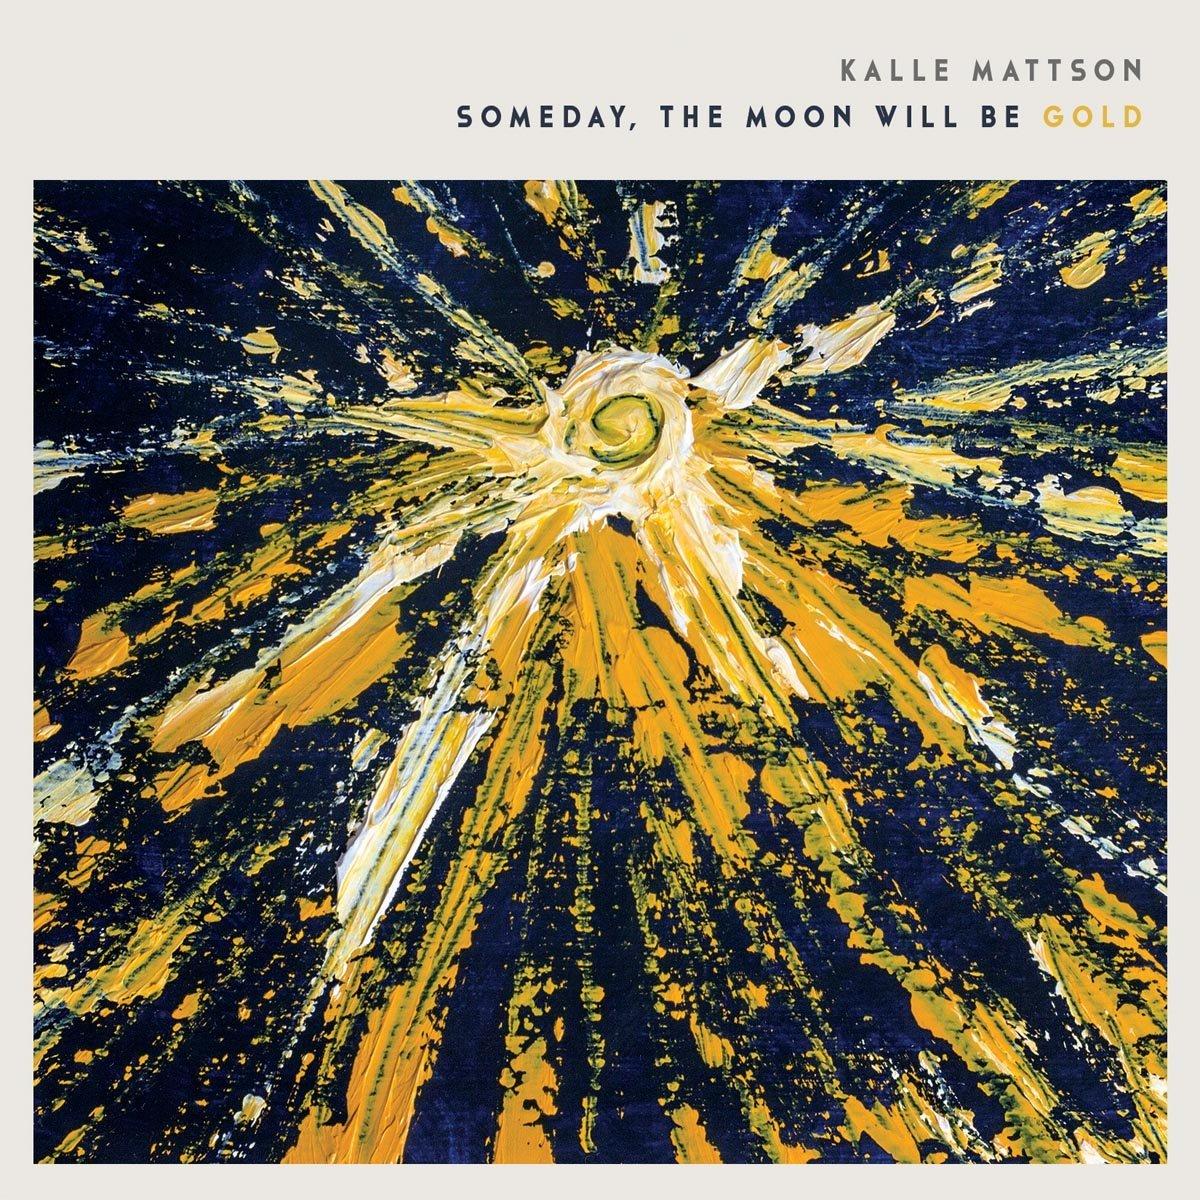 kalle-mattson-someday-moon-will-be-gold